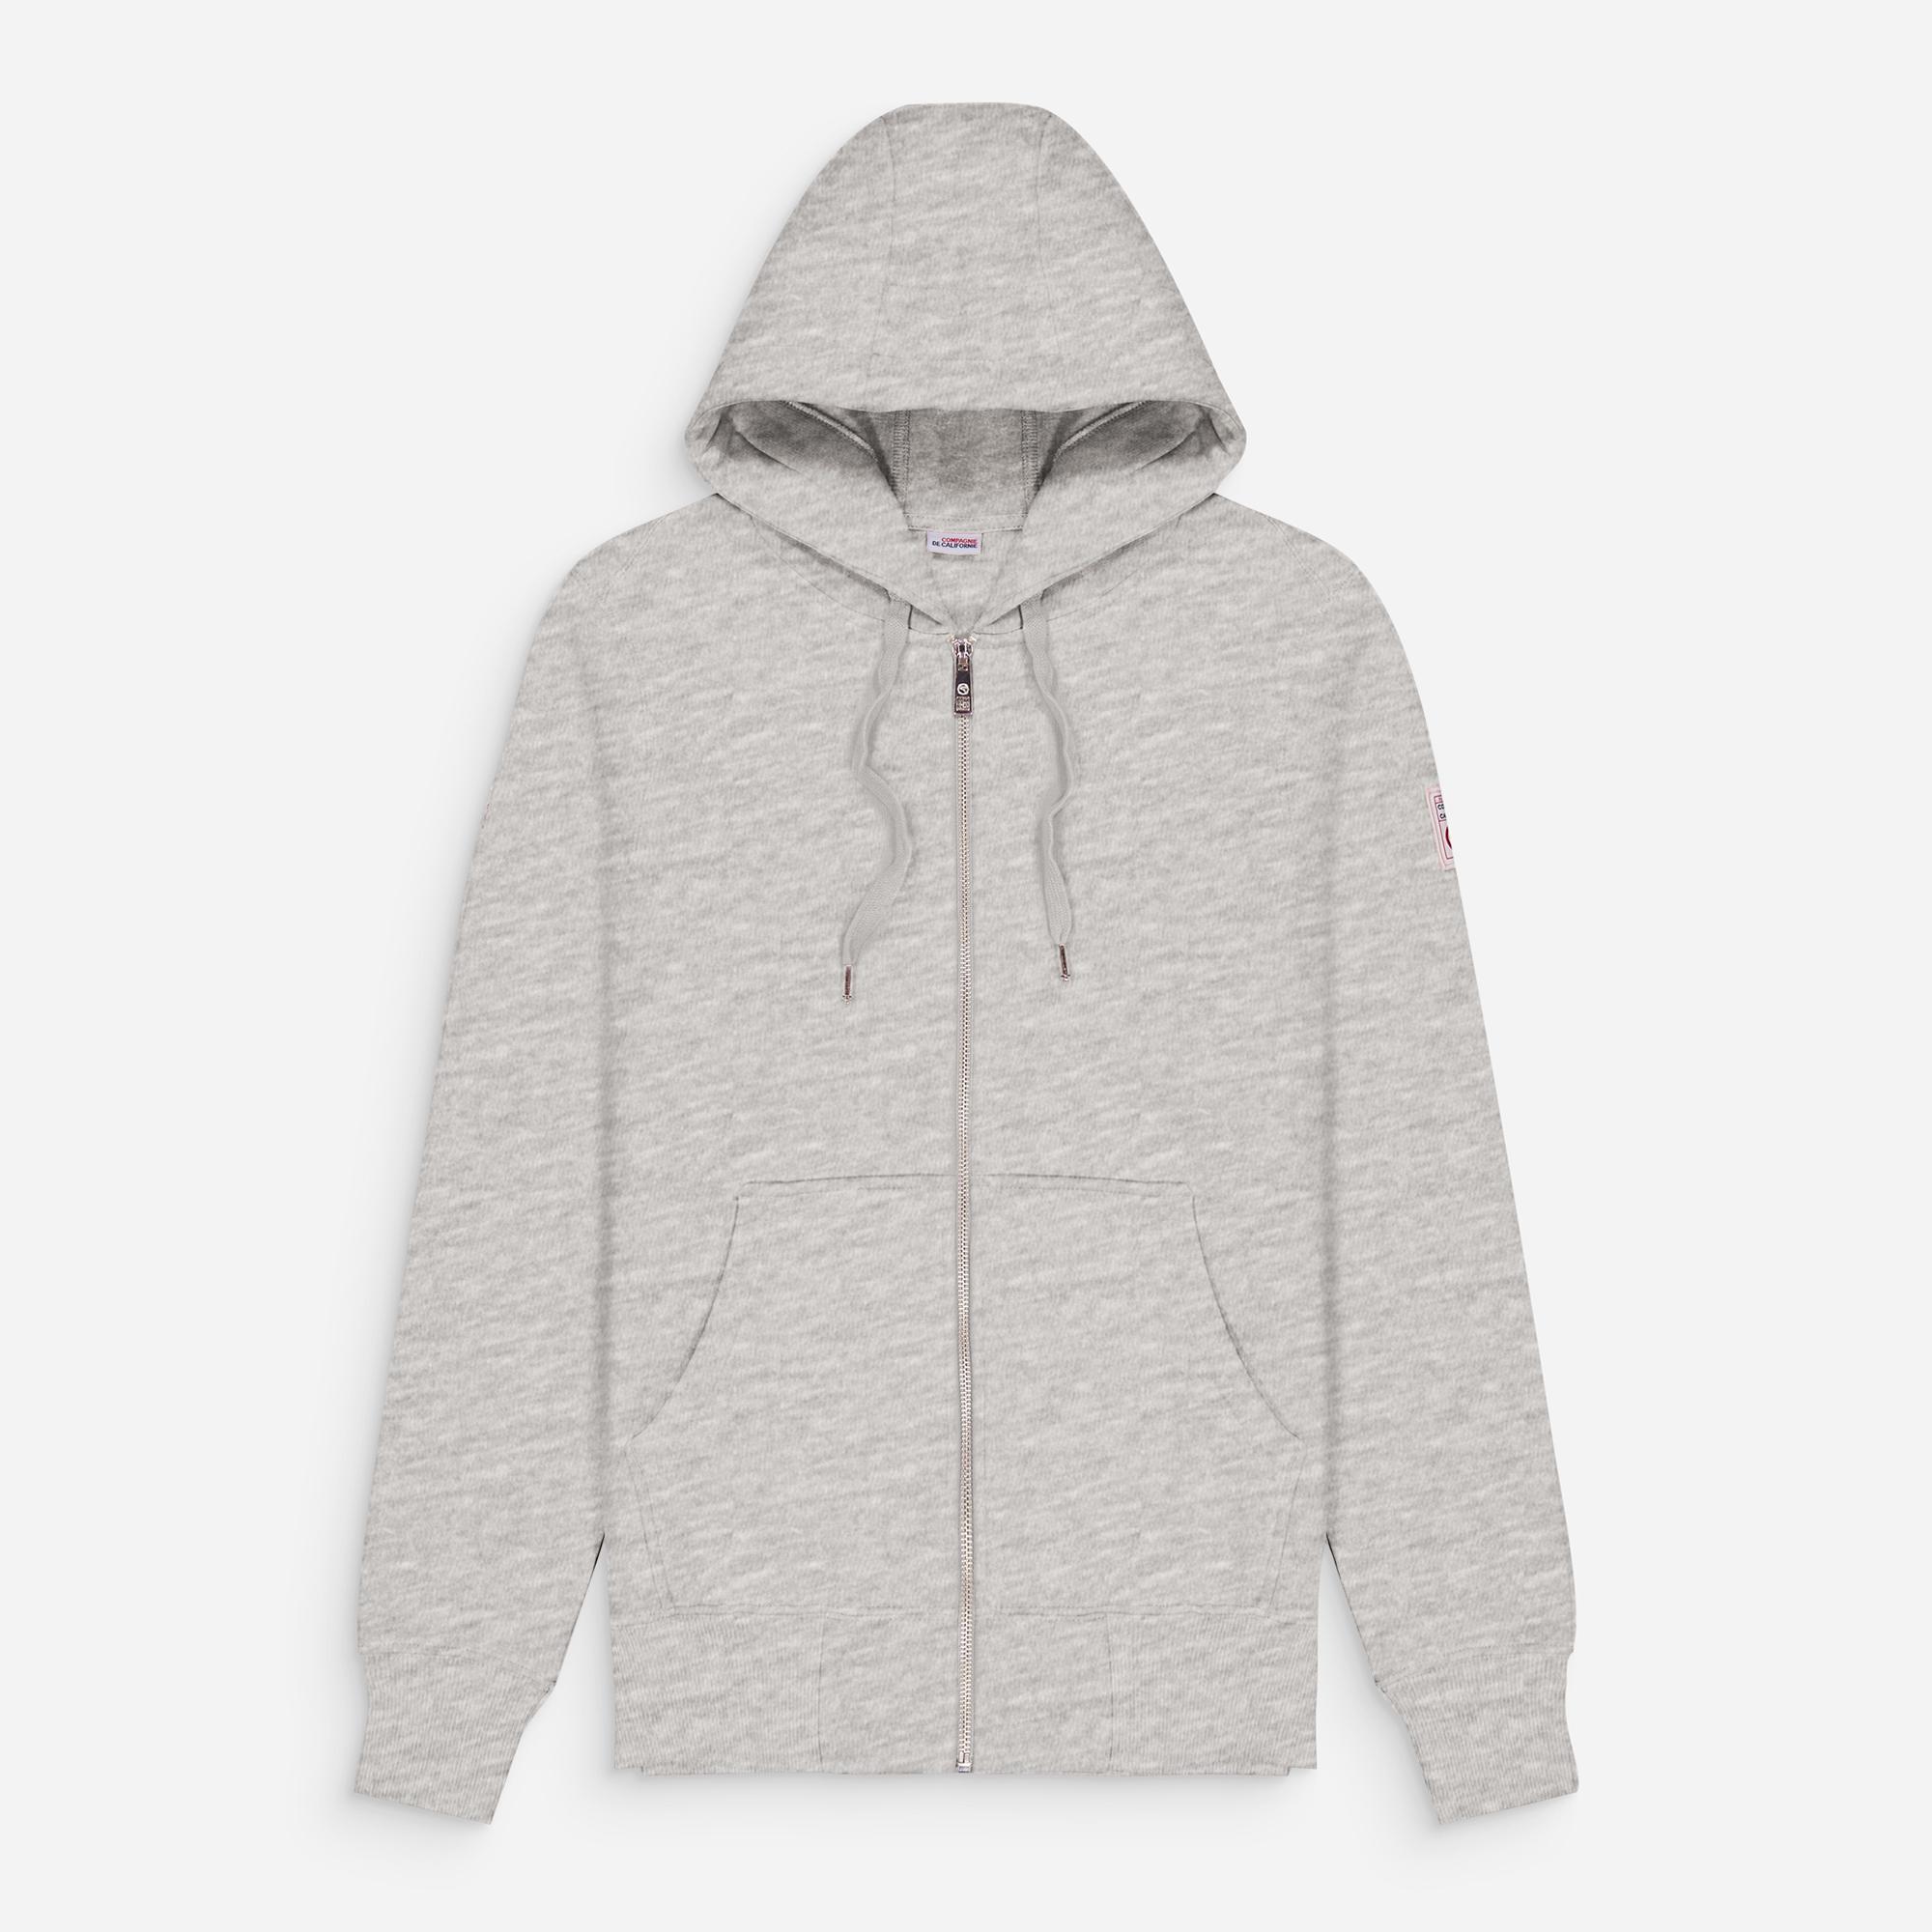 new cupertino hoodie zip heather grey 1.